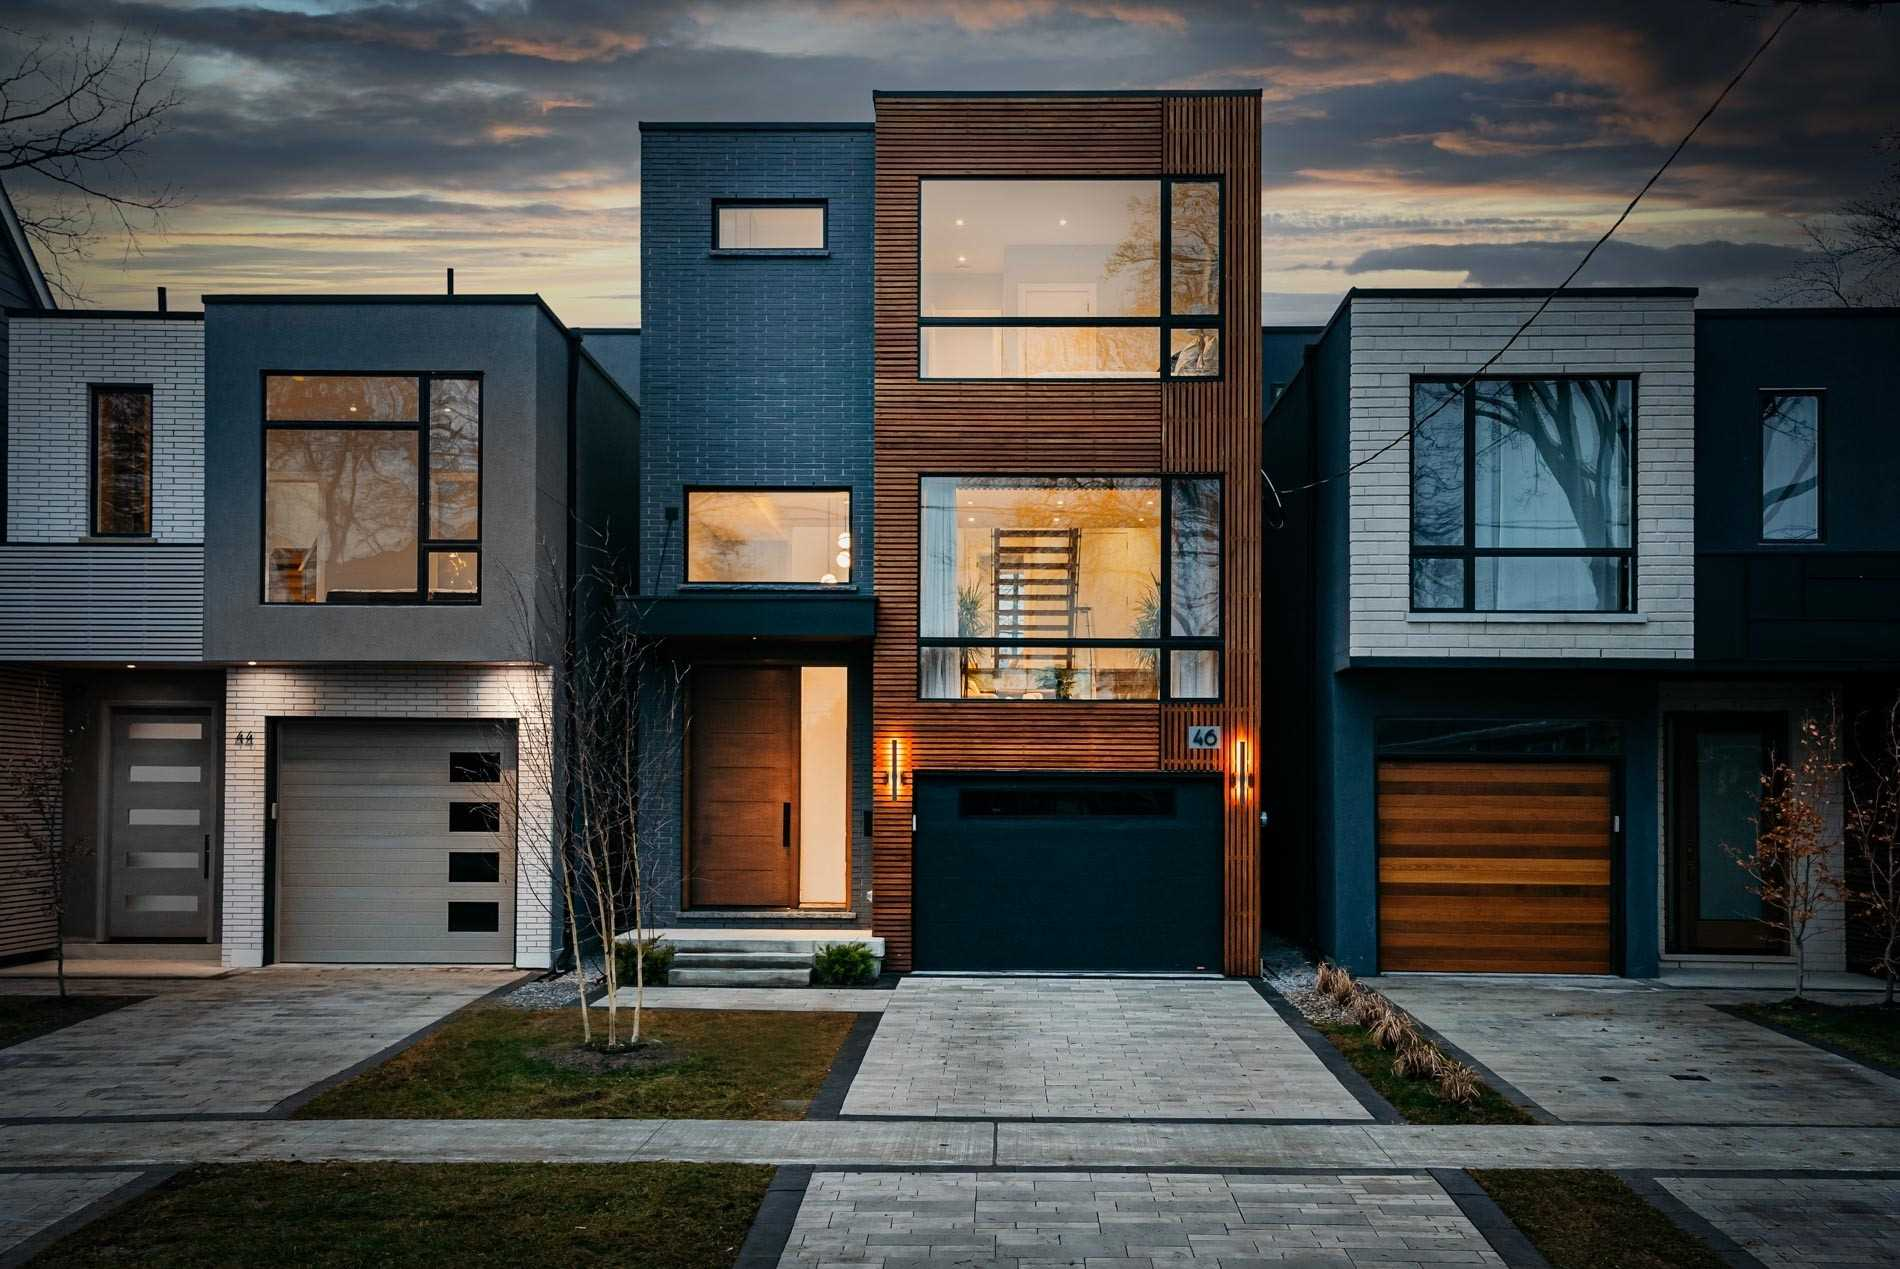 46 Lesmount Ave, Toronto, Ontario M4J 3V6, 4 Bedrooms Bedrooms, 10 Rooms Rooms,5 BathroomsBathrooms,Detached,For Sale,Lesmount,E5087433